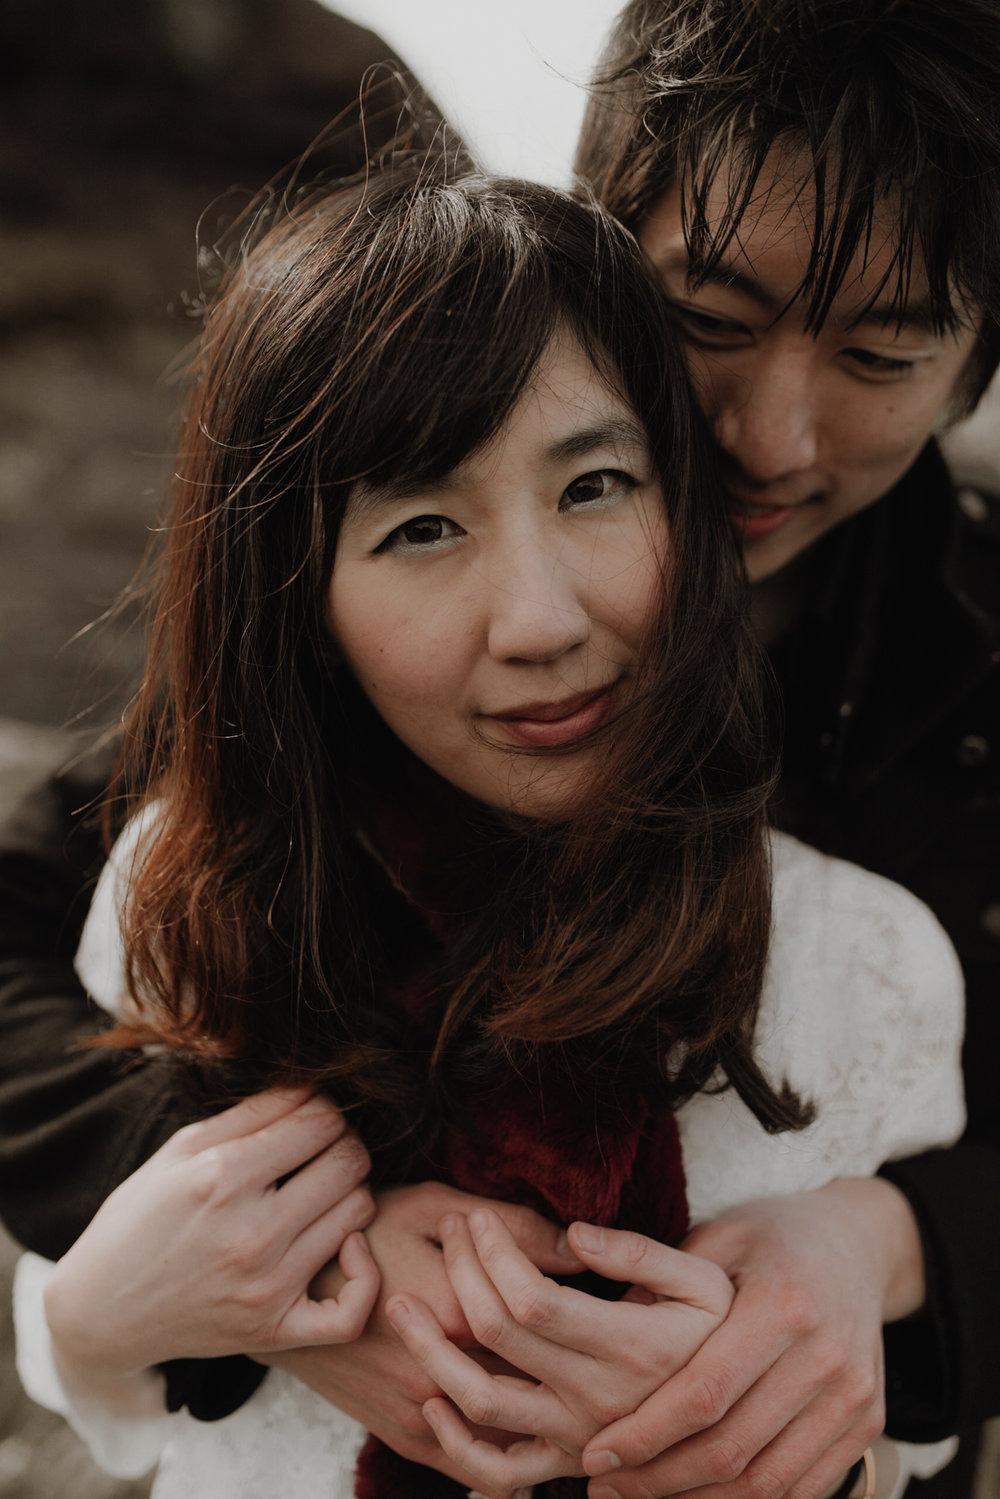 seattle-wedding-photographer-kerouac-0398.jpg